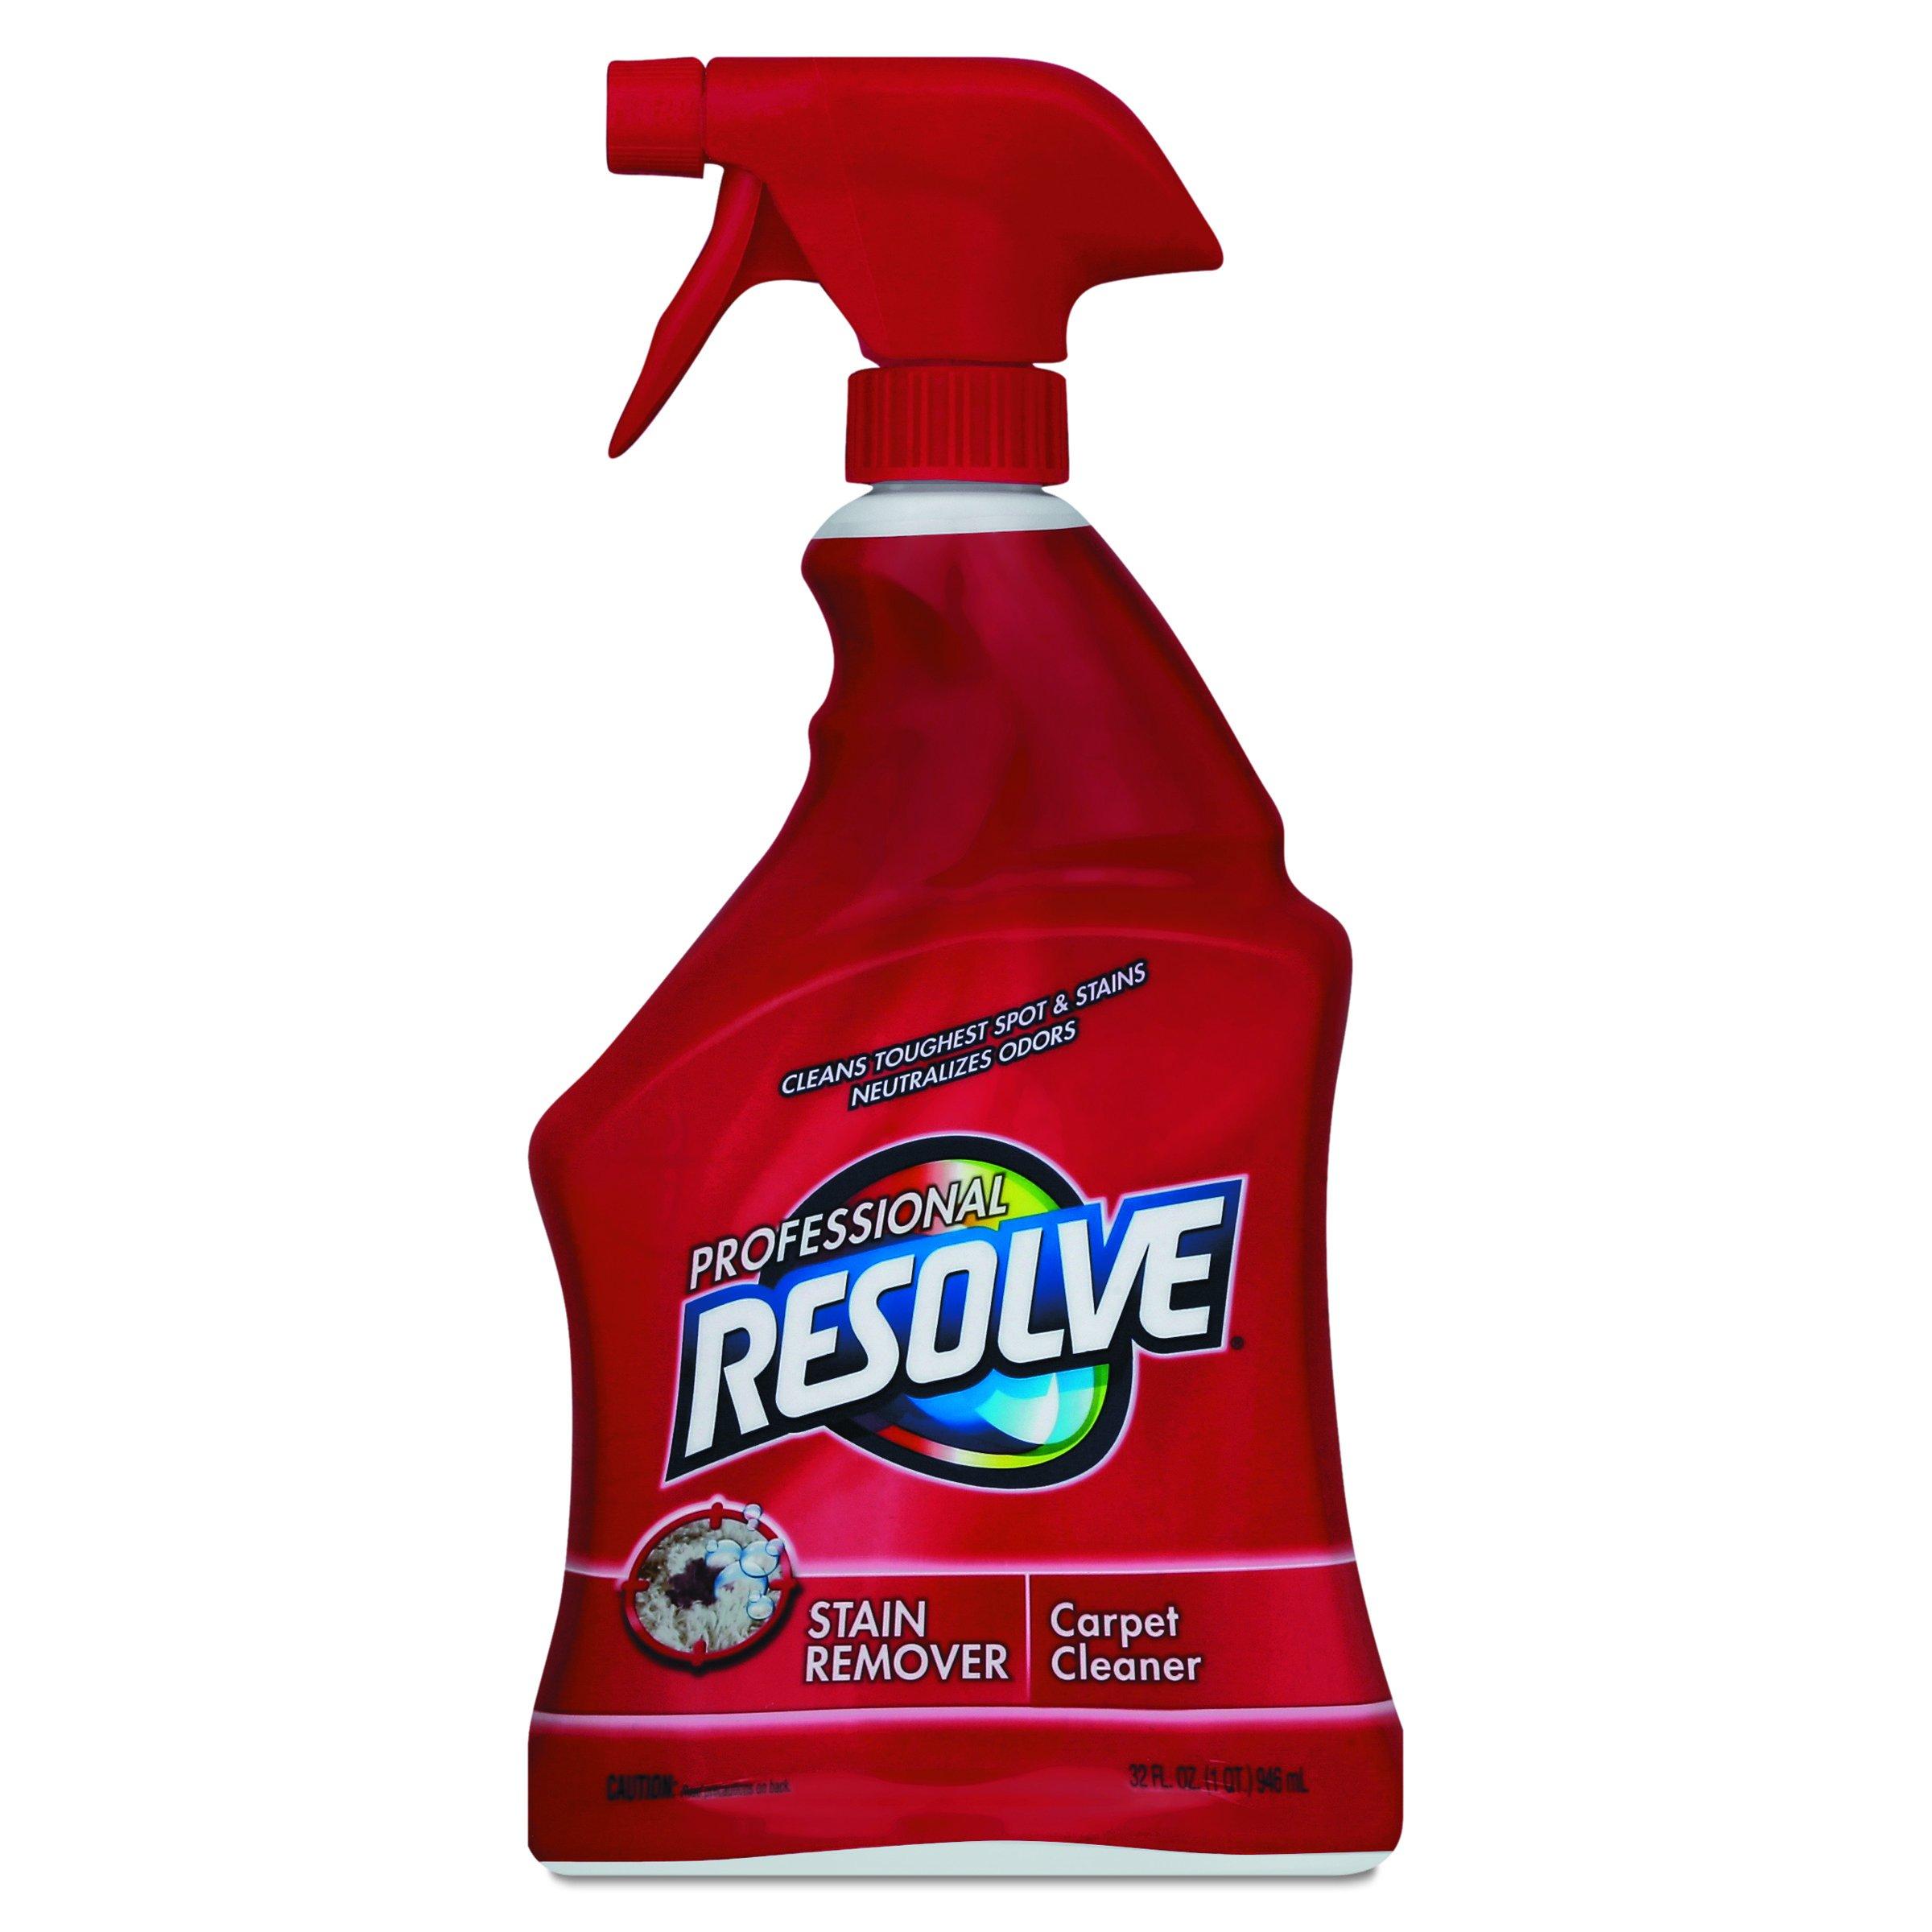 Professional RESOLVE 97402CT Carpet Cleaner, 32oz Spray Bottles (Case of 12)